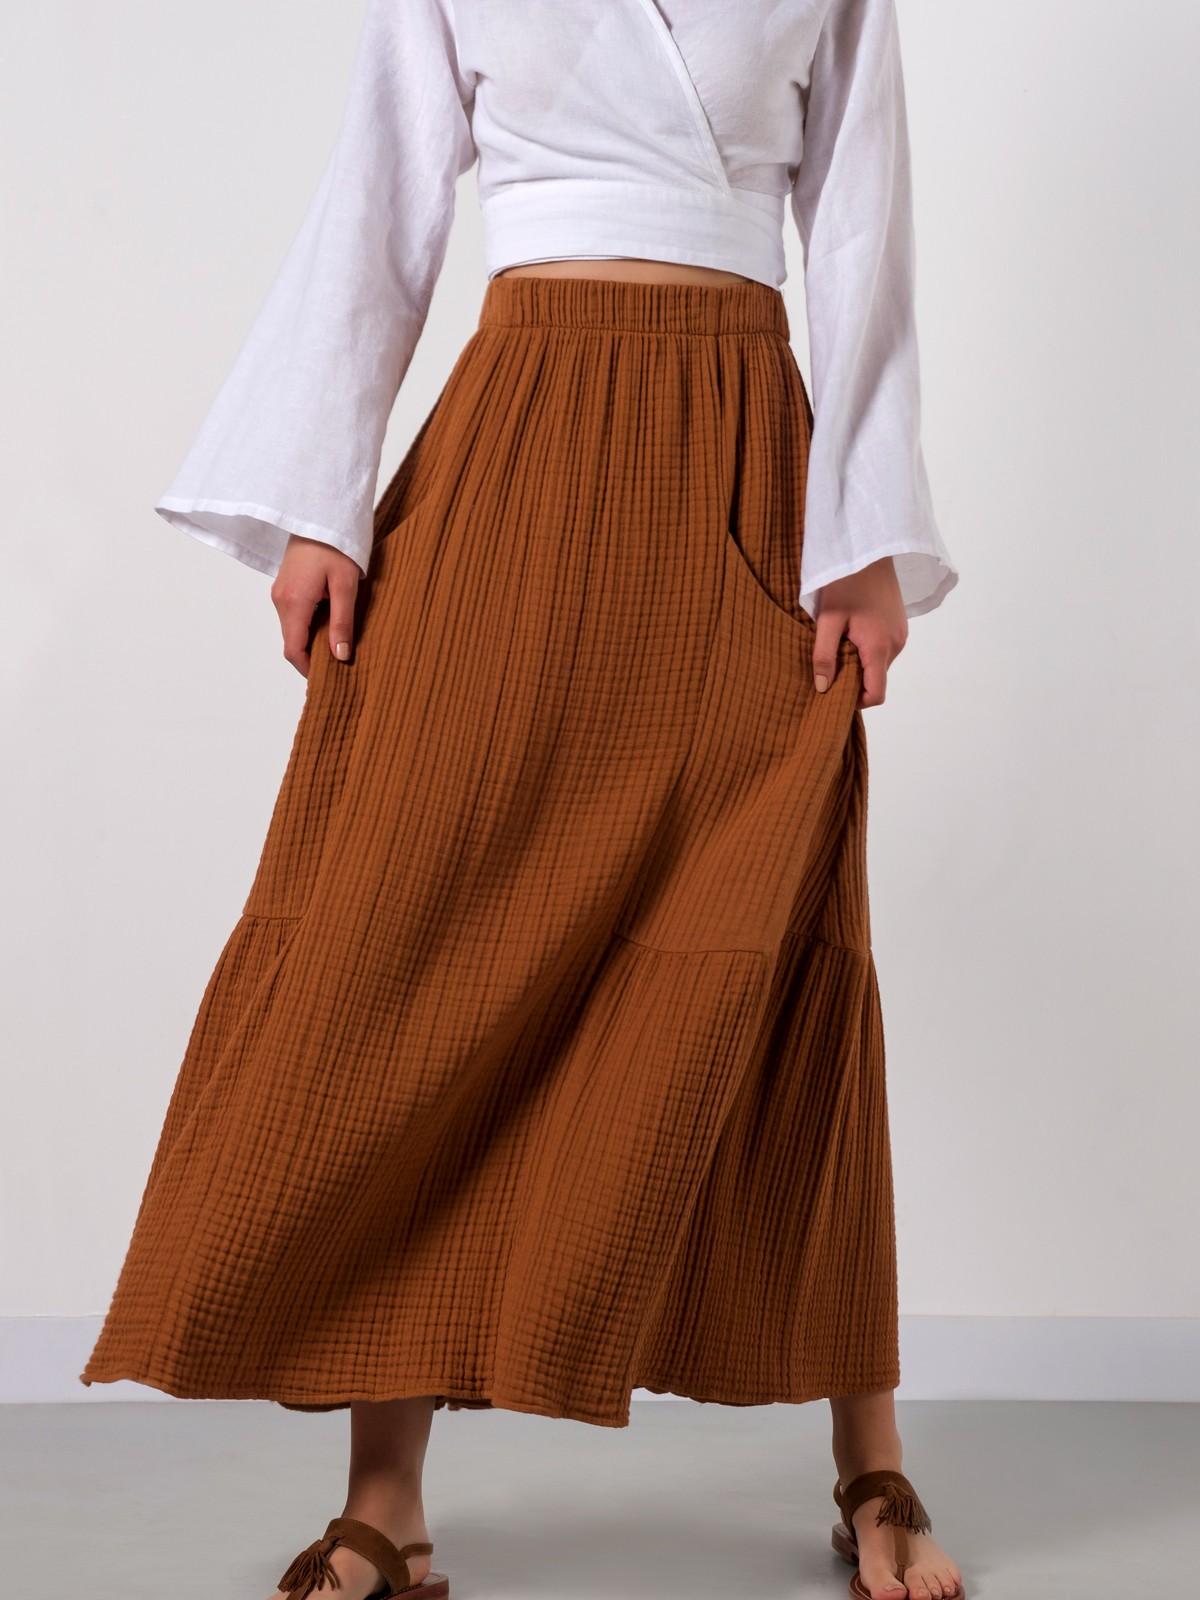 alba-skirt-brown4-1200x1600w